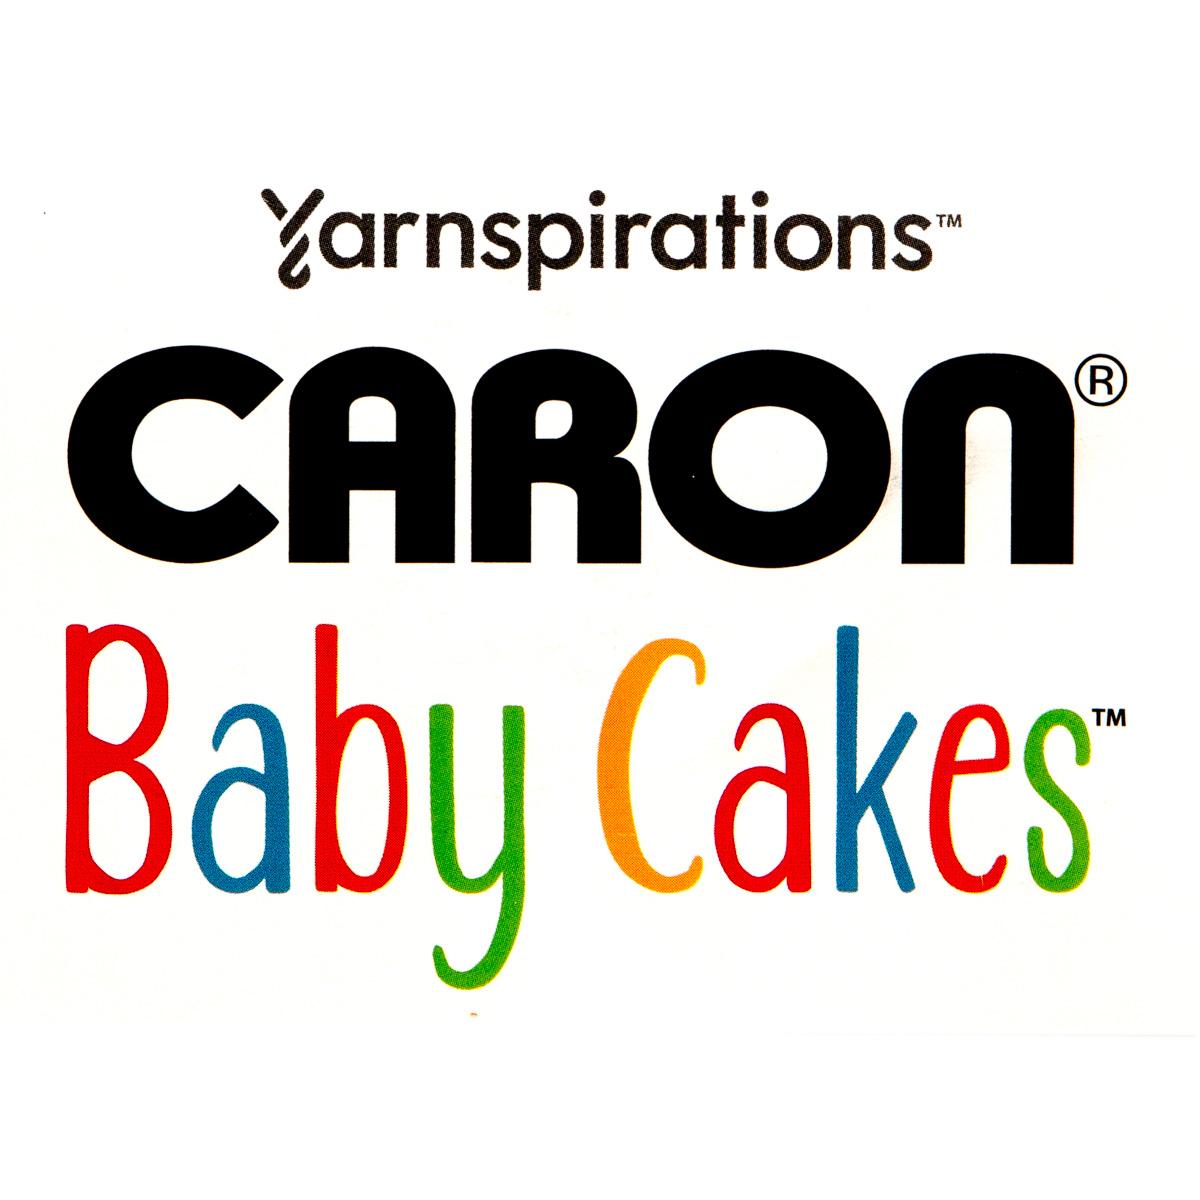 Caron-Baby-Cakes-Yarnspirations-Soft-Acrylic-Blend-Medium-4-Yarn-Cake-Knitting thumbnail 12